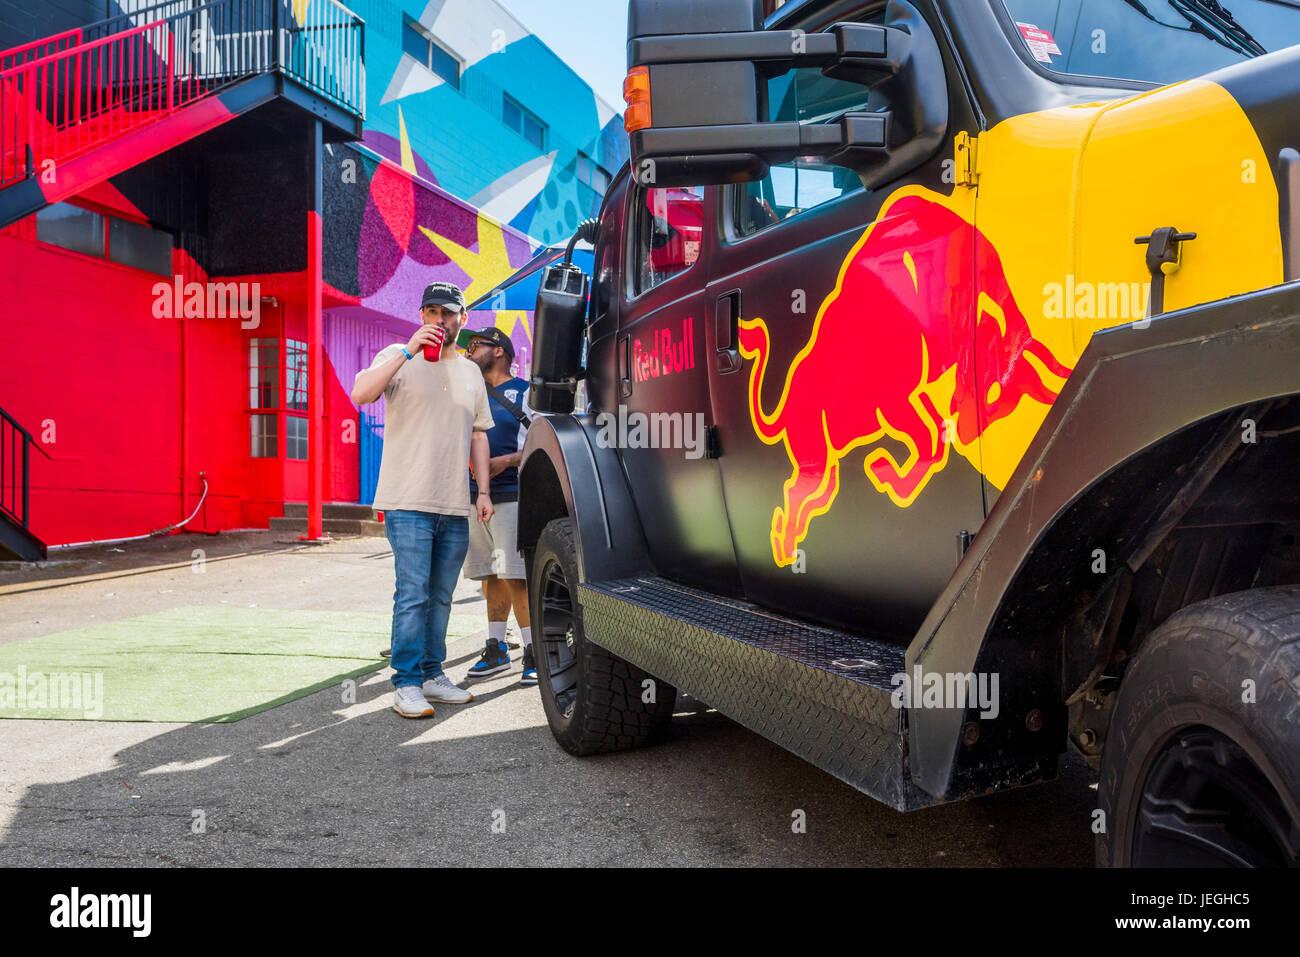 Vancouver, Canada. Jun 24, 2017. Red Bull véhicule, fête de rue Strathcona, Vancouver Festival murale, Photo Stock